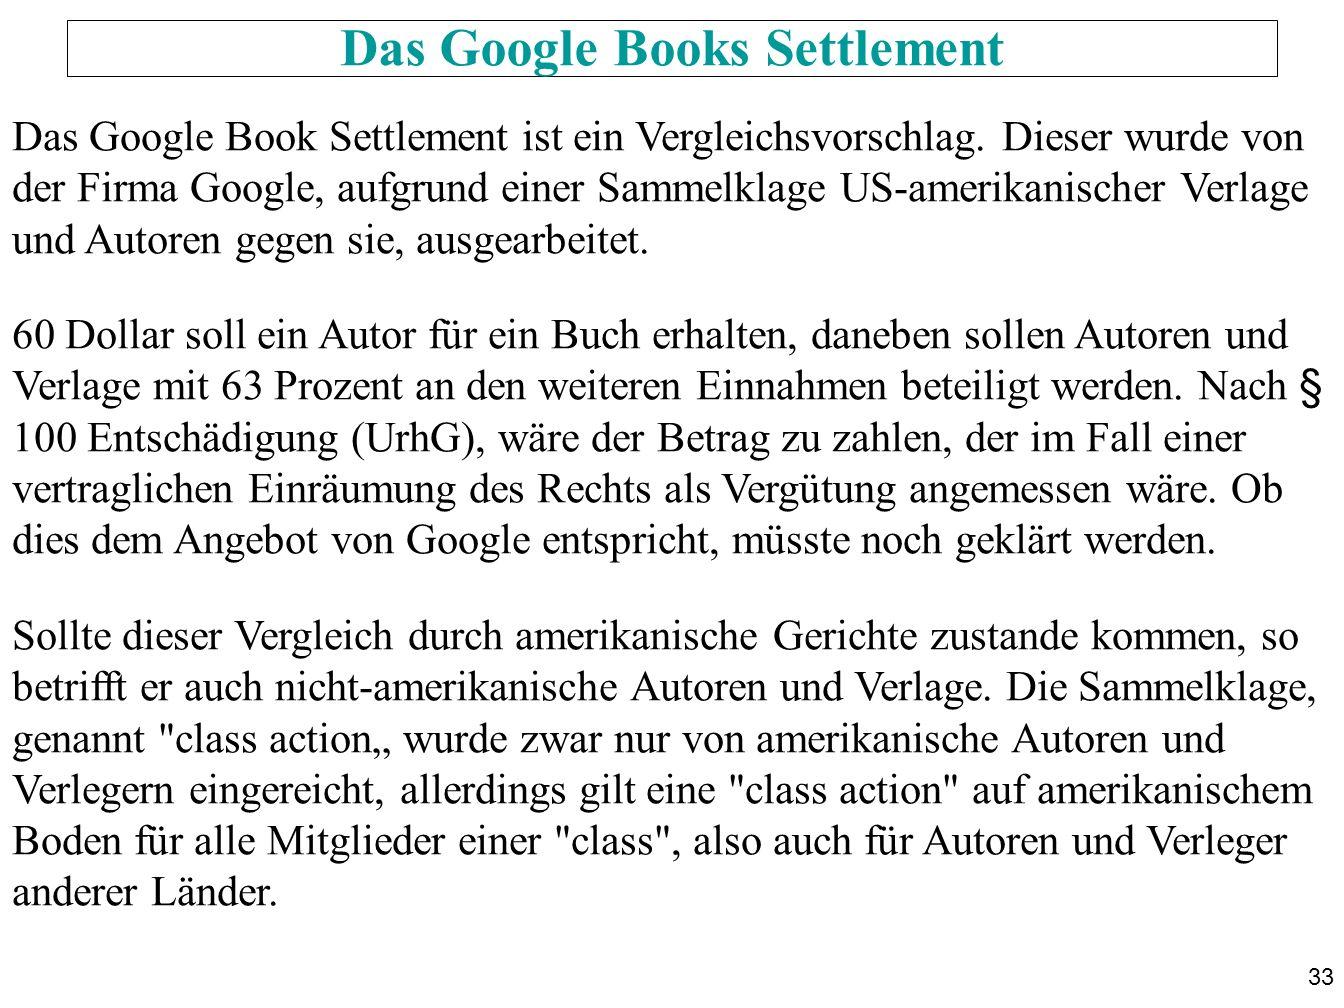 Das Google Books Settlement